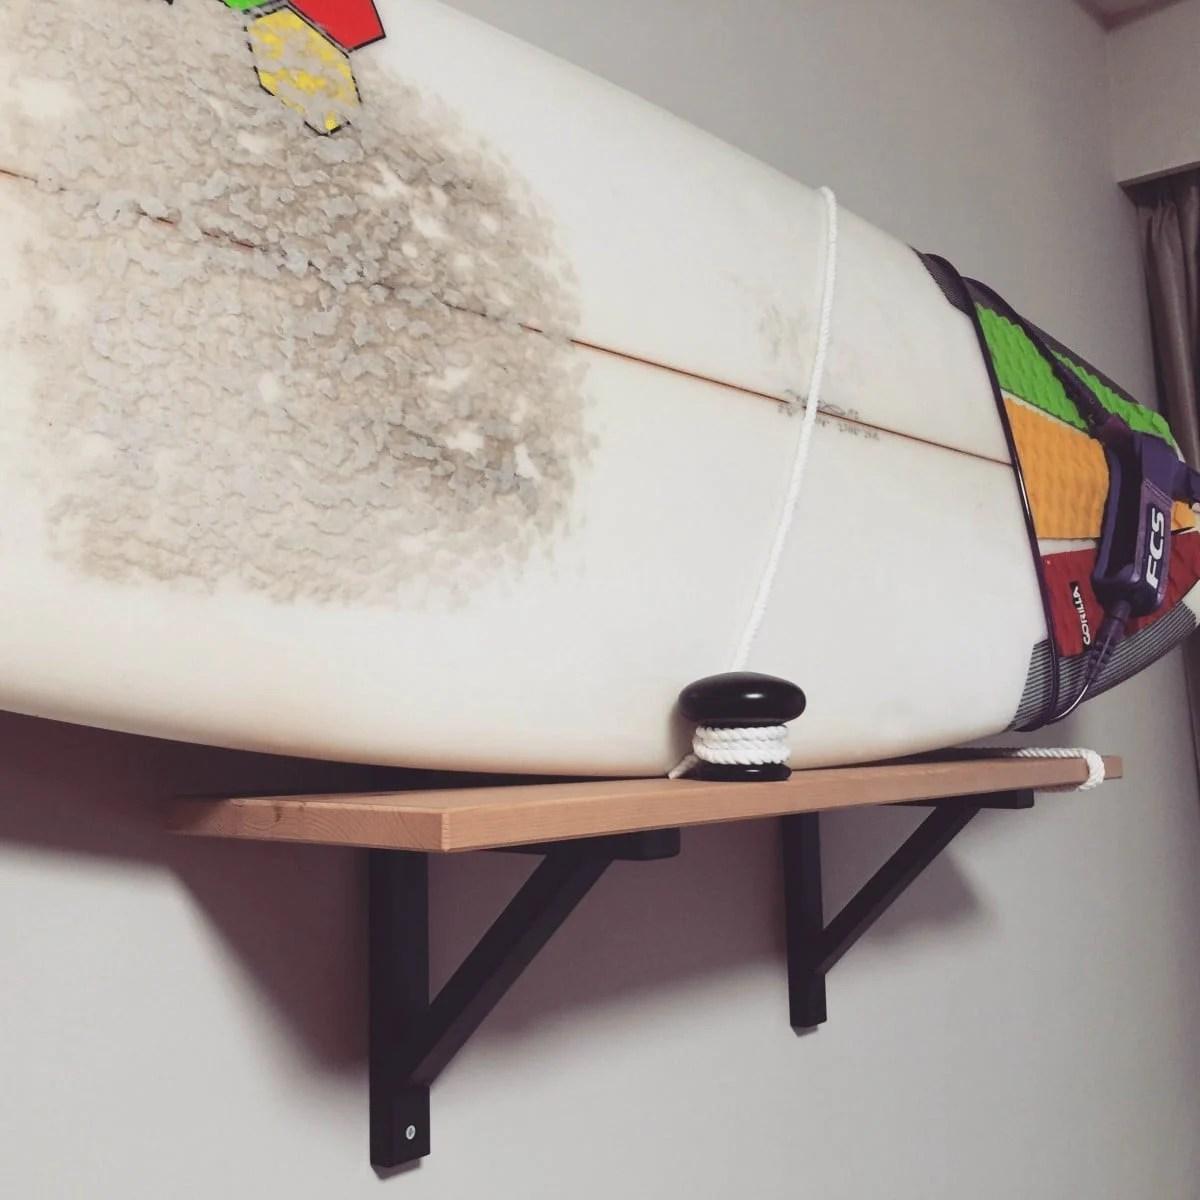 Dock bollard surfboard rack - IKEA Hackers